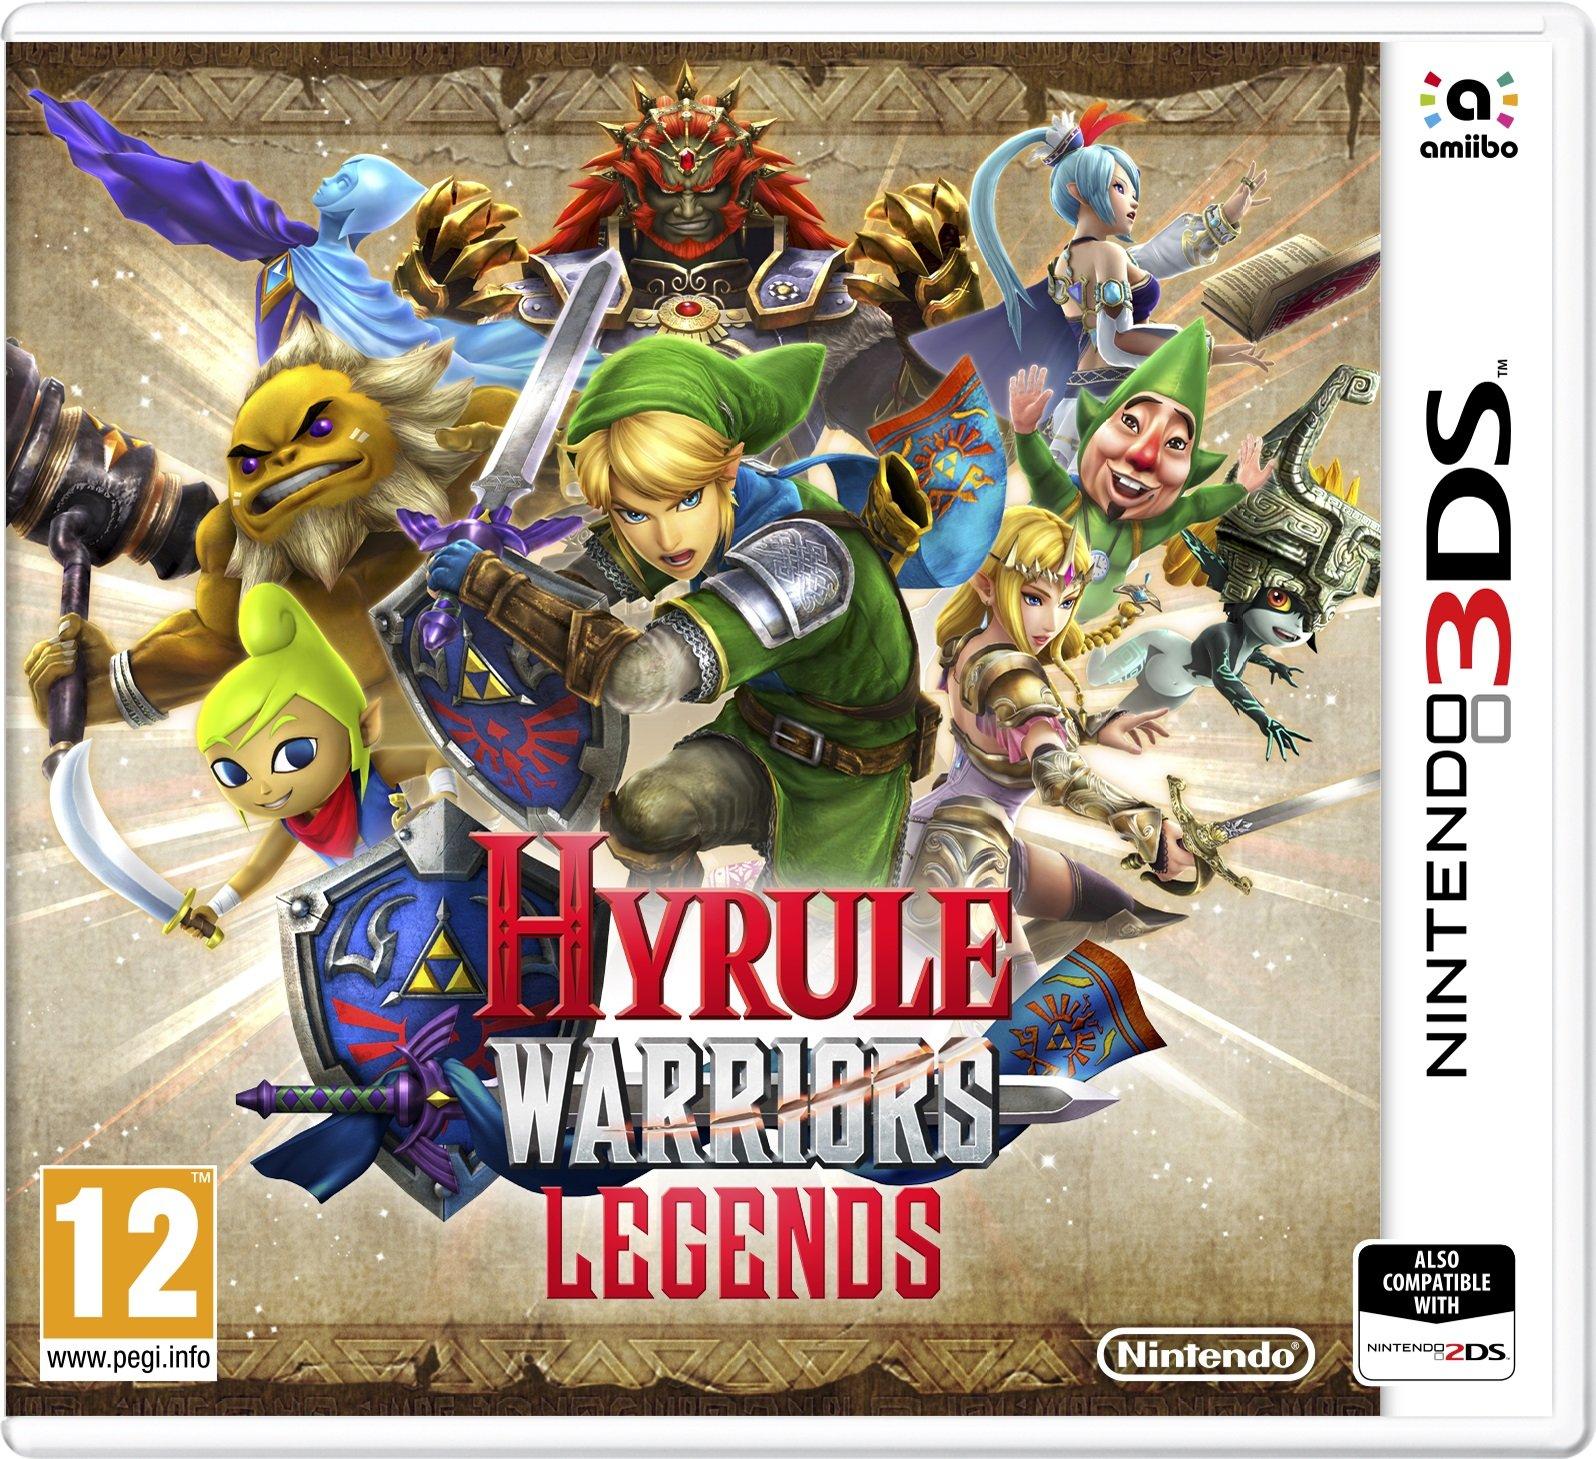 Hyrule Warriors: Legends (3DS) Review 11